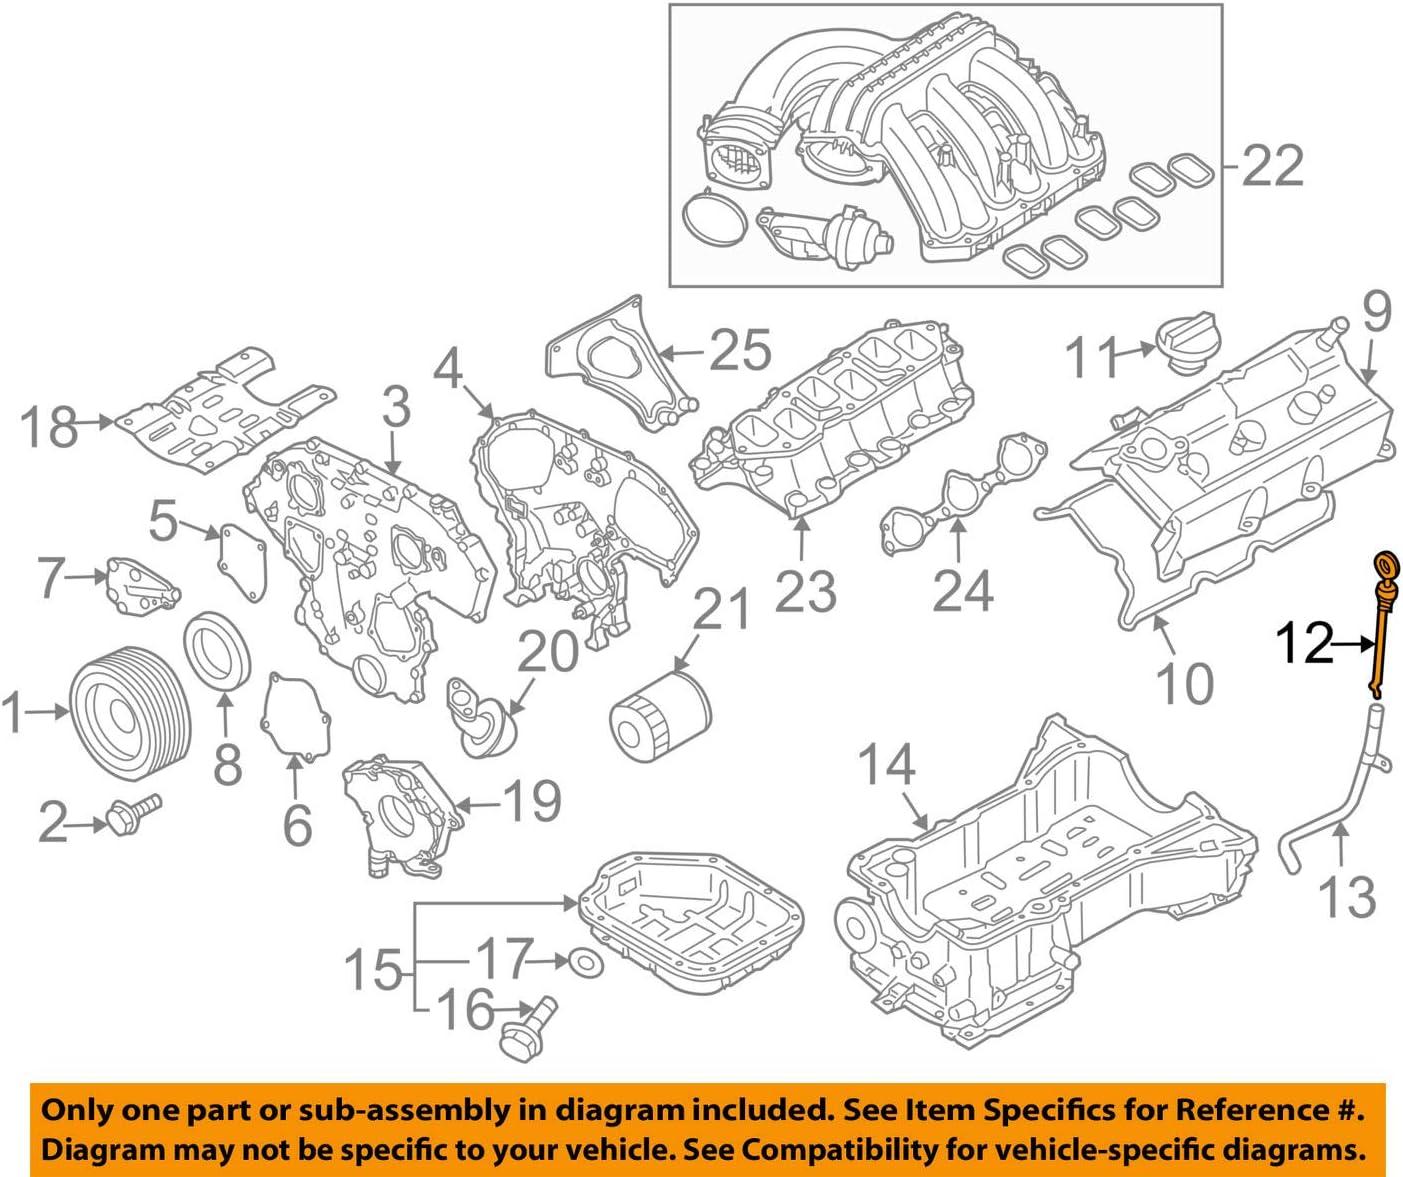 2004 nissan frontier engine diagram amazon com 2005 2014 nissan xterra frontier pathfinder 4 0l  amazon com 2005 2014 nissan xterra